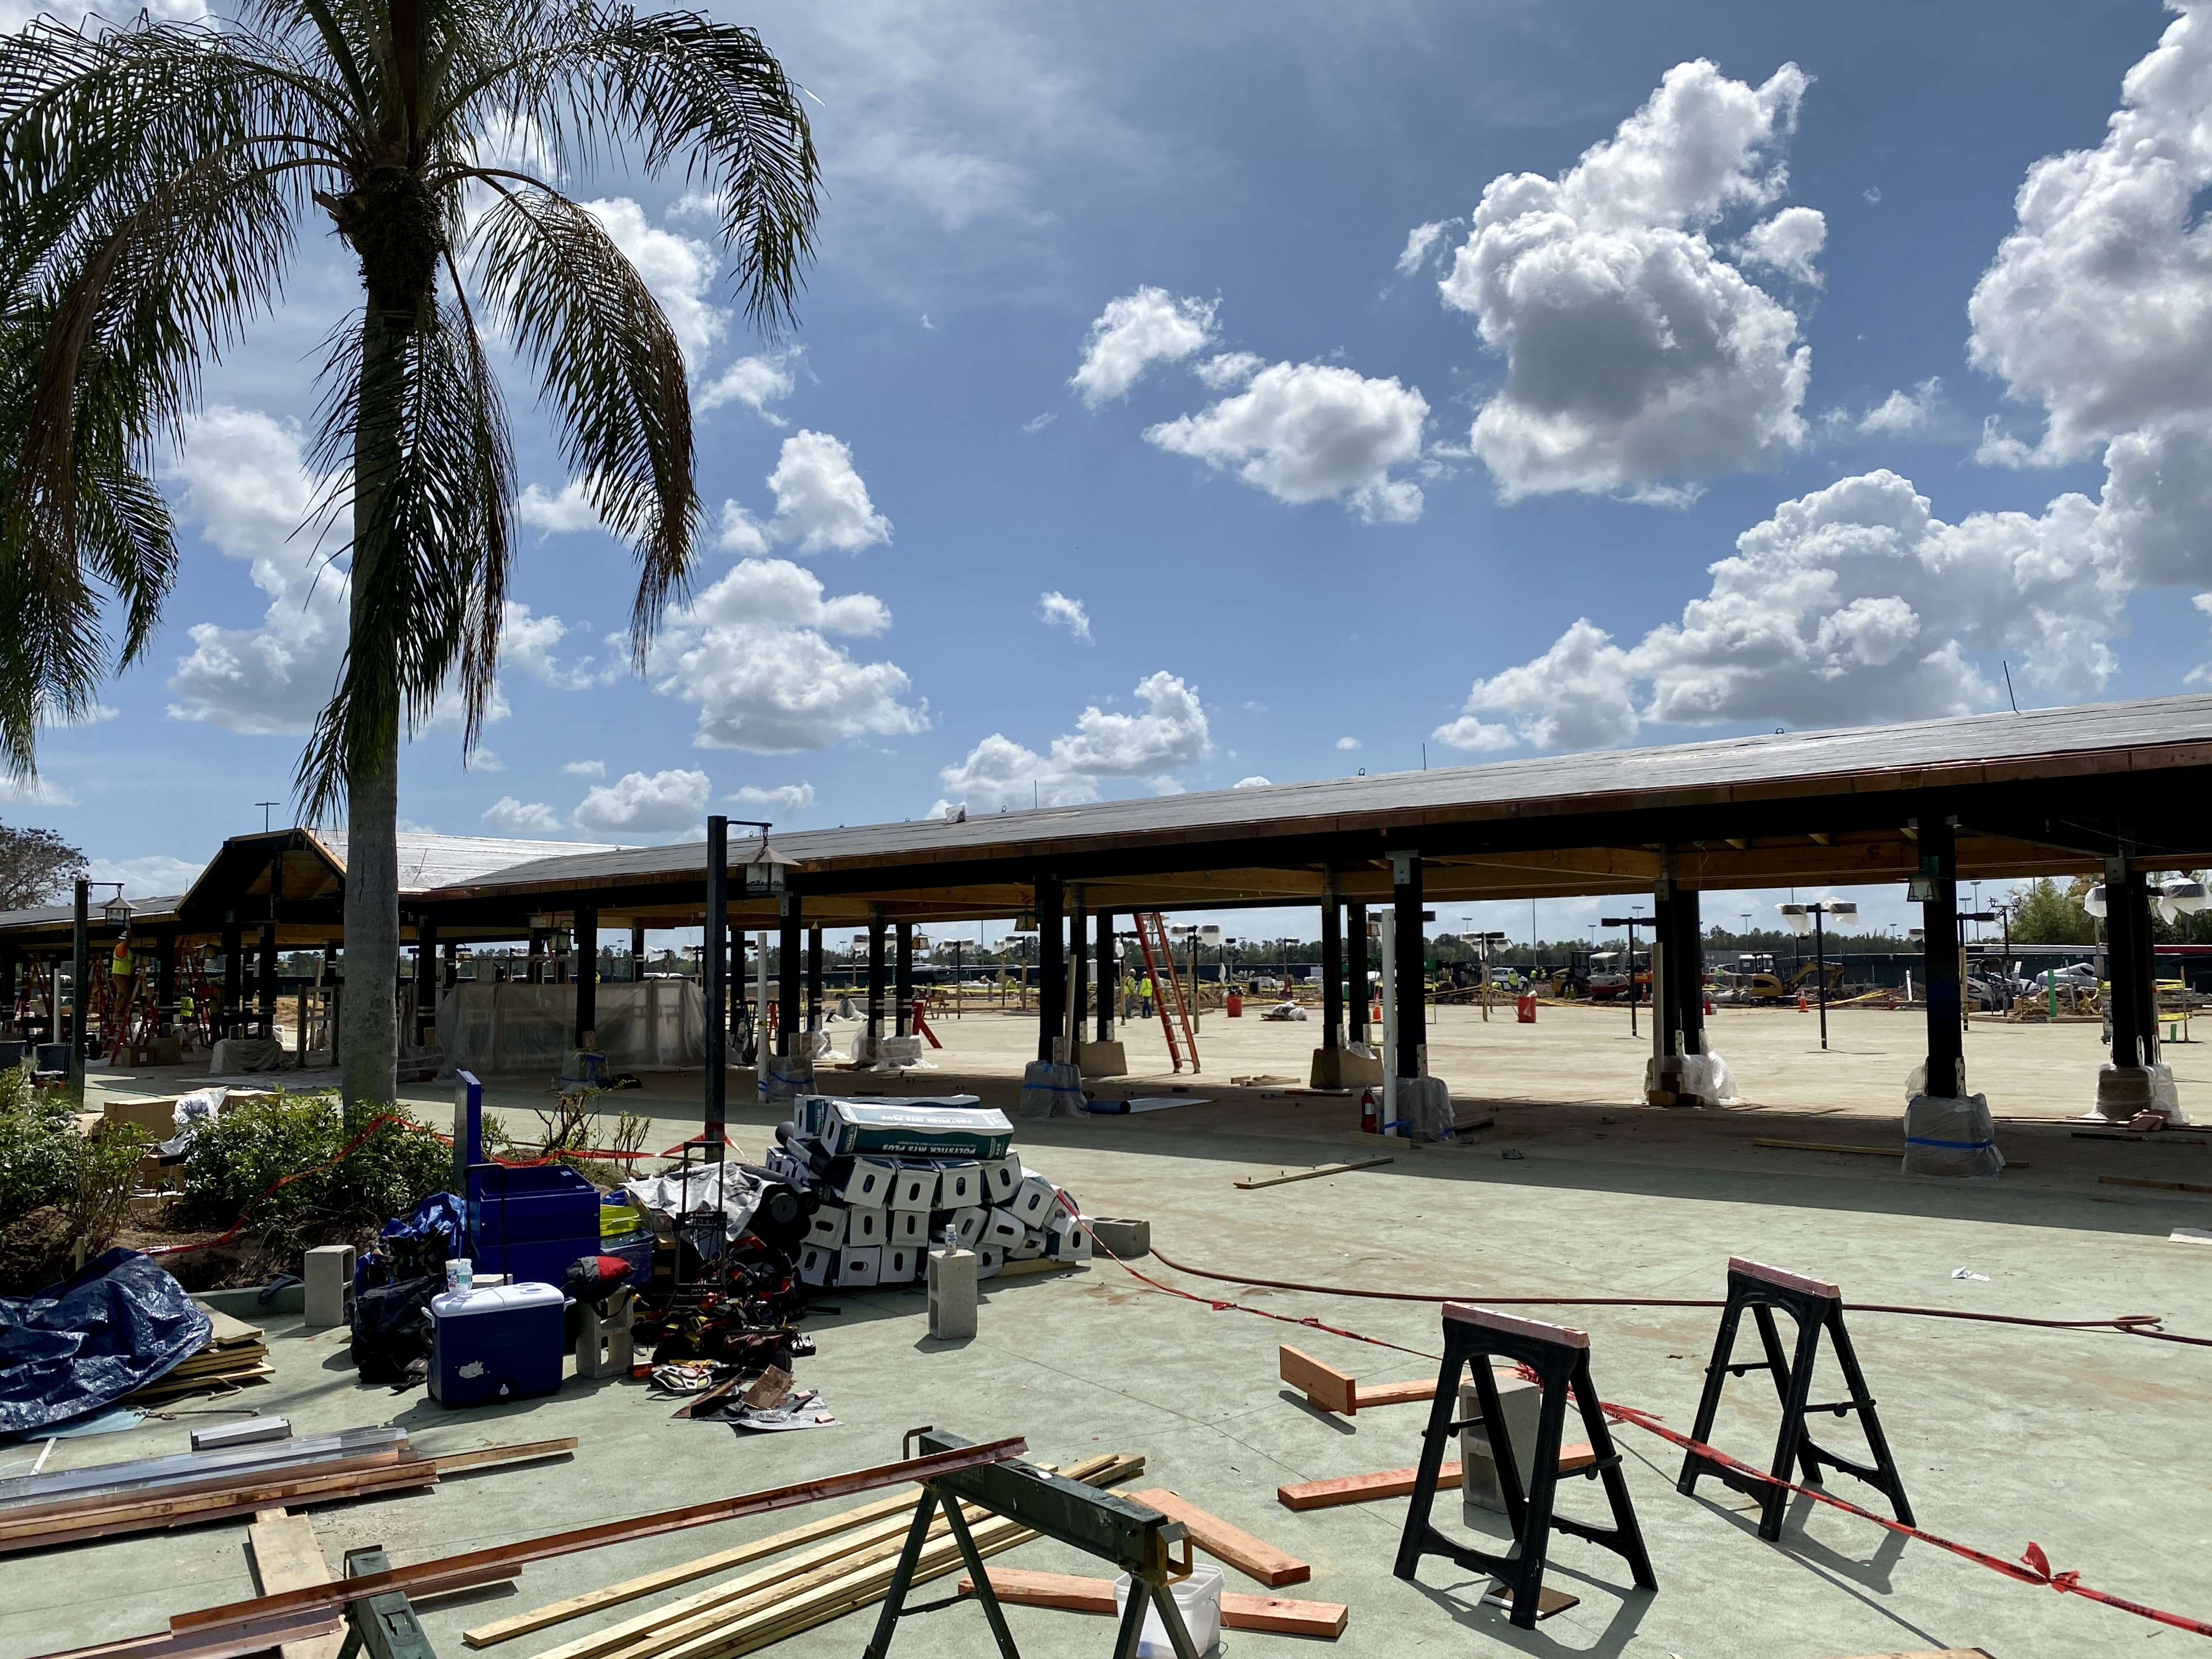 https://wdwnt.com/2020/03/photos-disneys-animal-kingdom-construction-entrance-plaza-update/